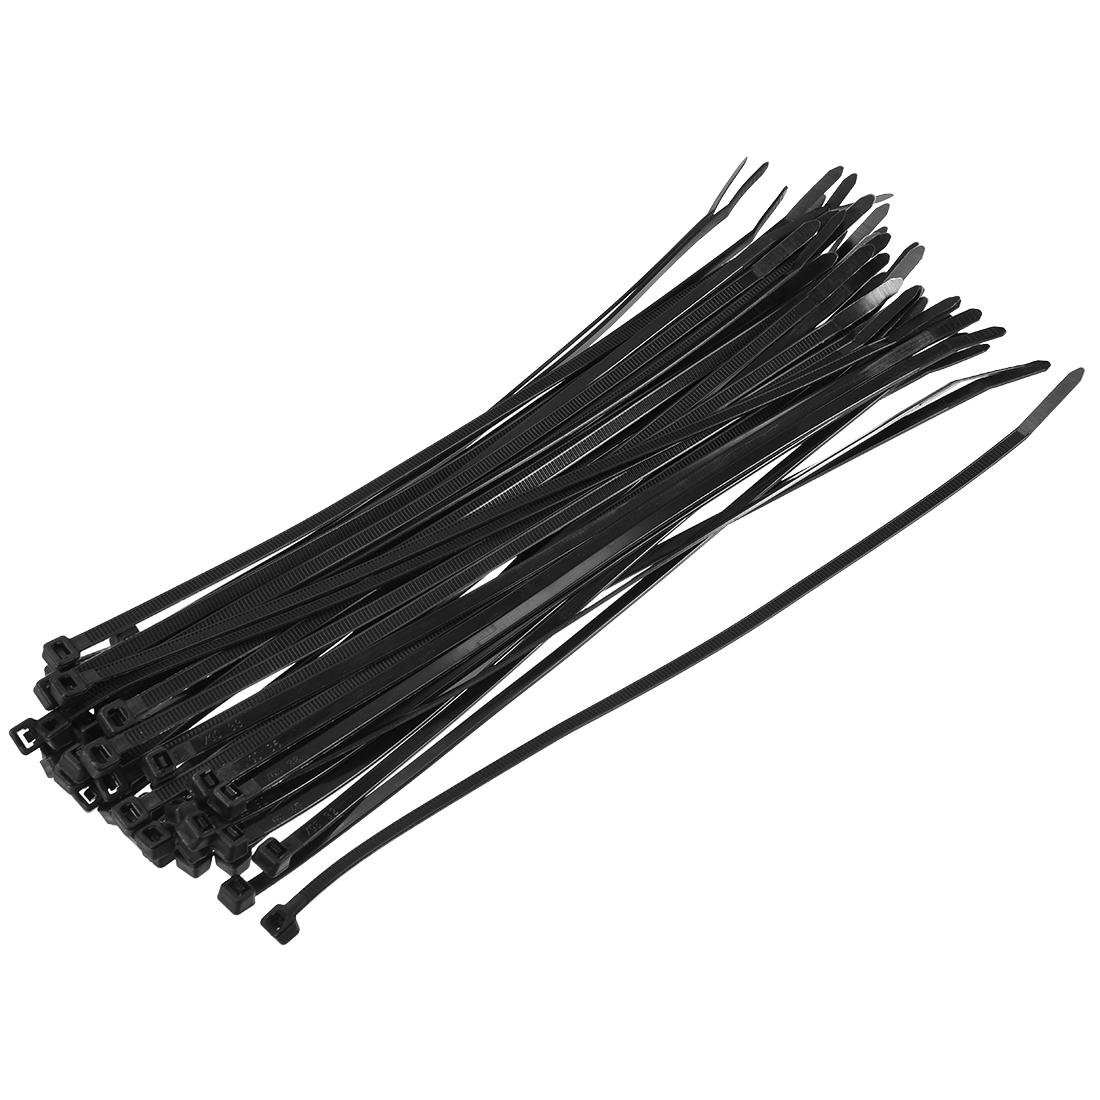 Cable Zip Ties 200mmx5.2mm Self-Locking Nylon Tie Wraps Black 100pcs